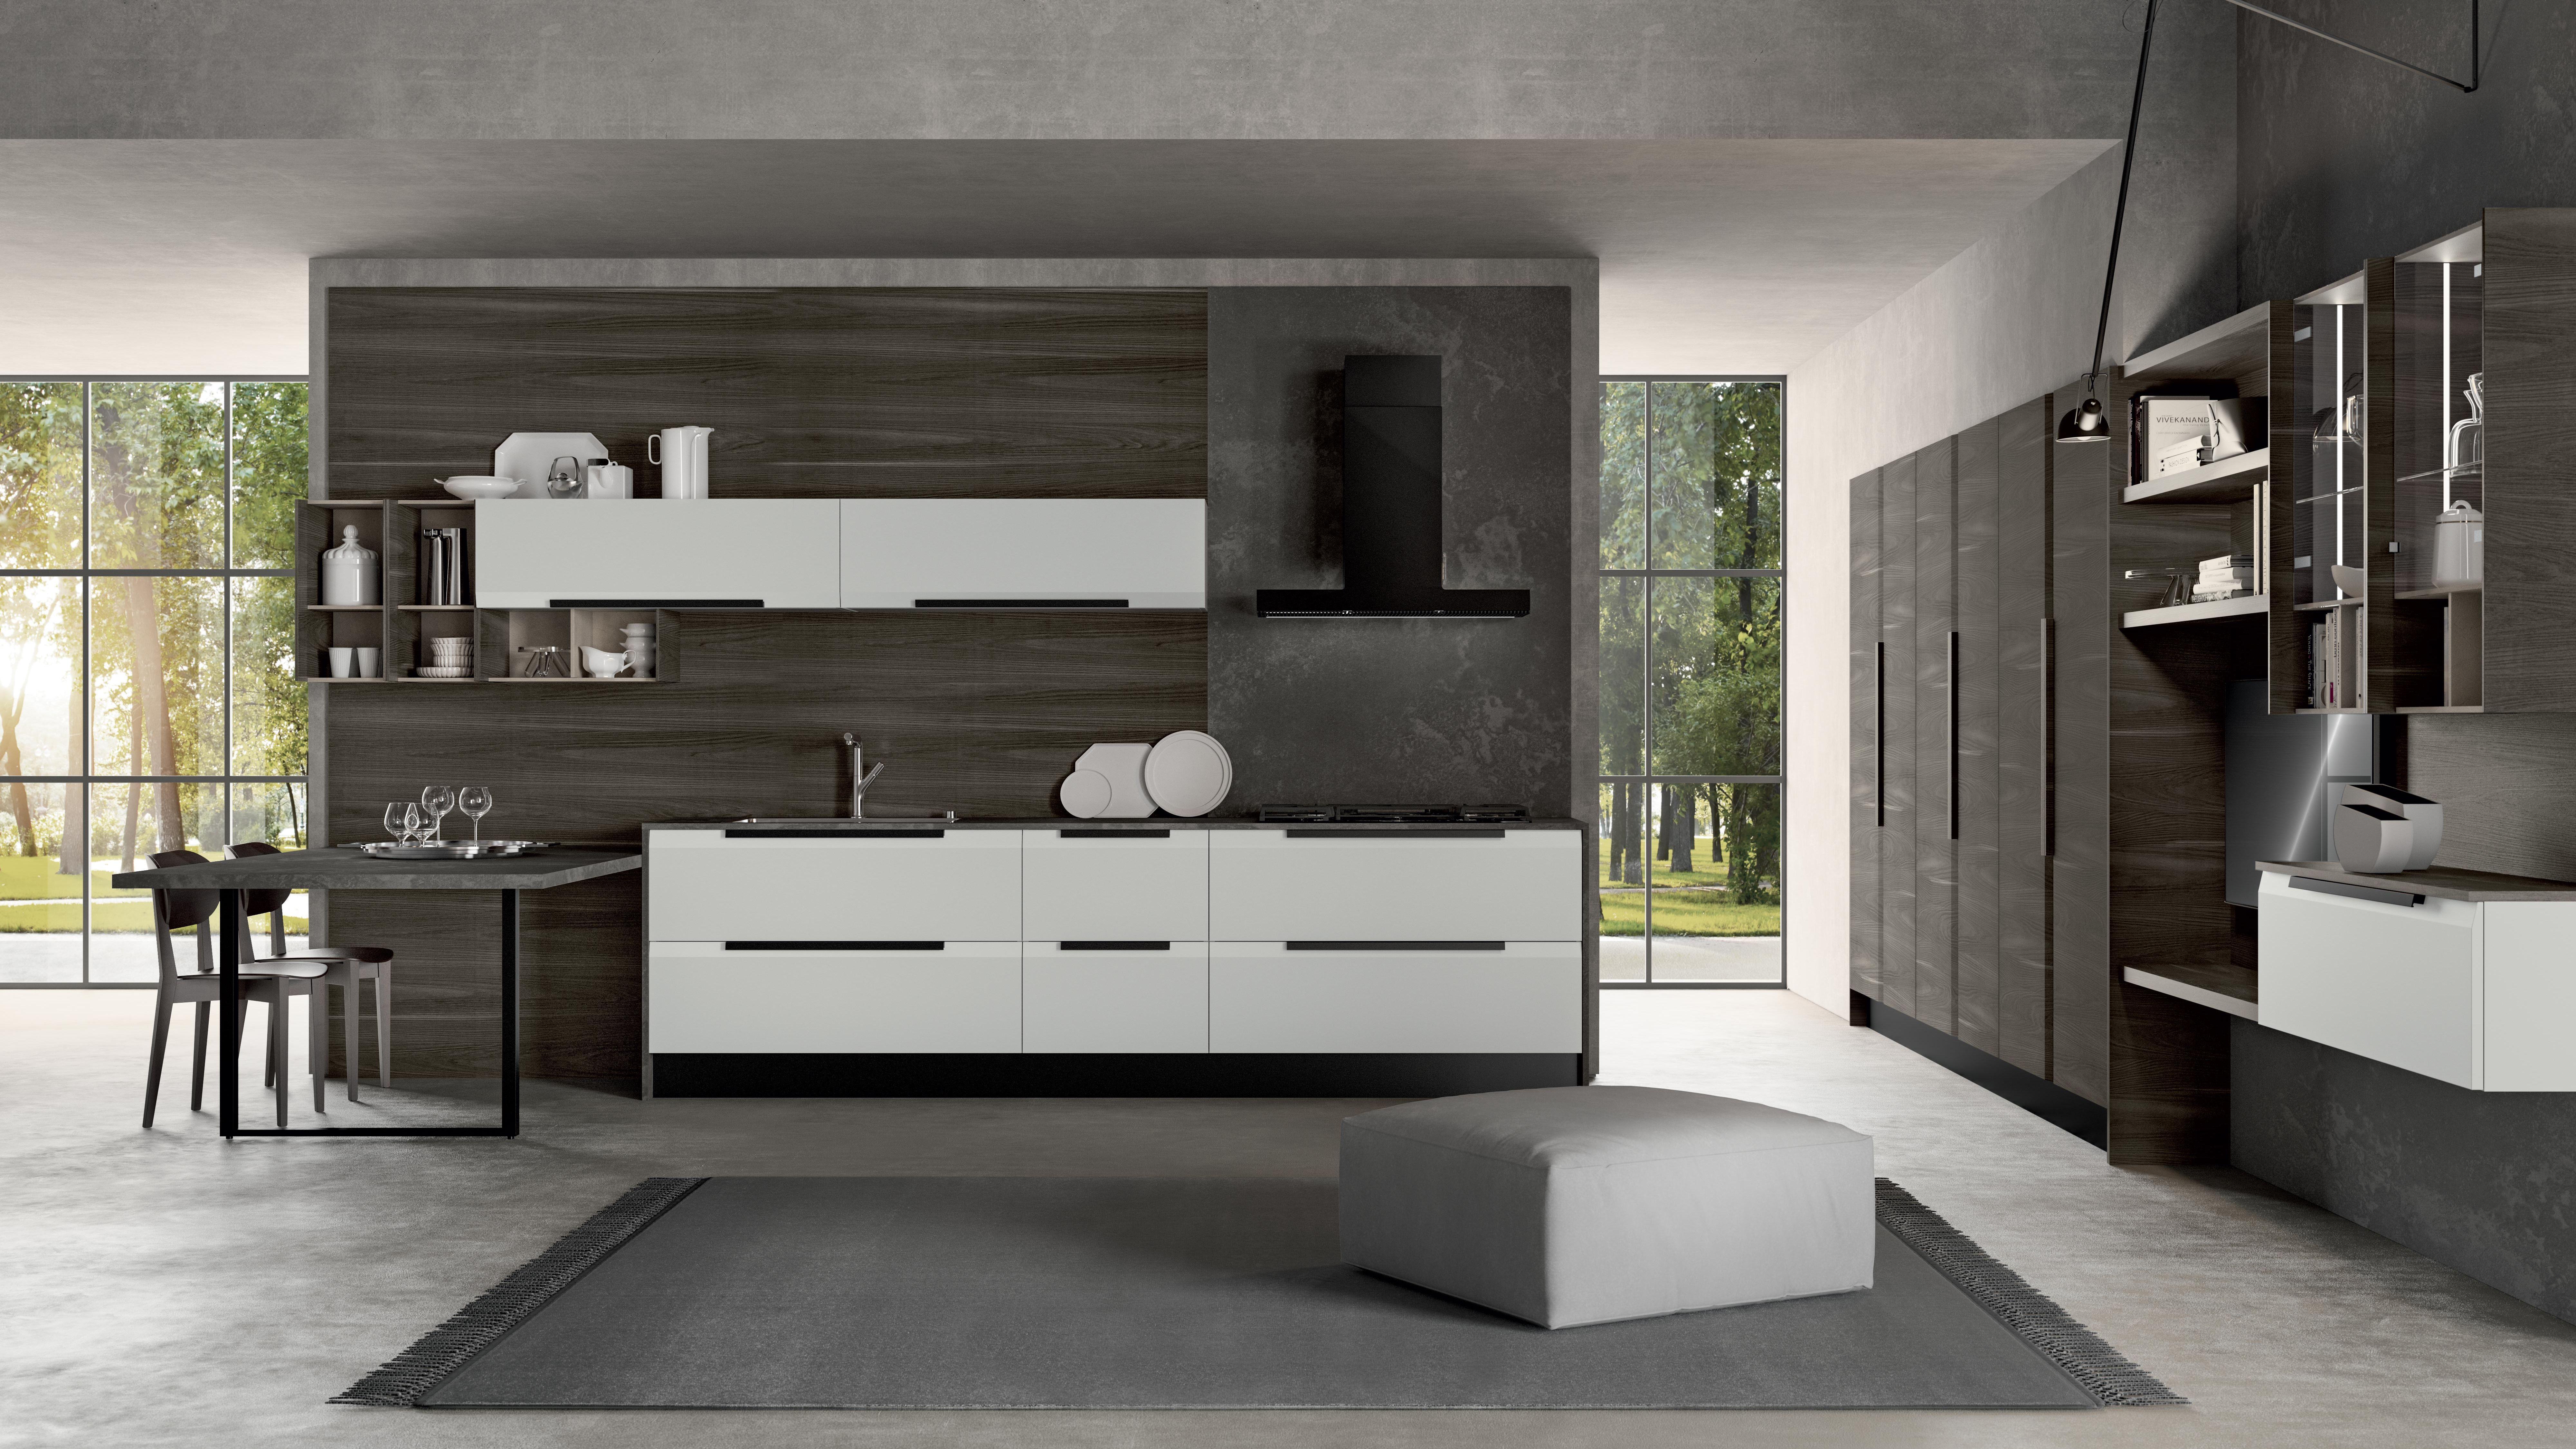 Mobili e arredamento cucina febal casa for Cucine moderne scure